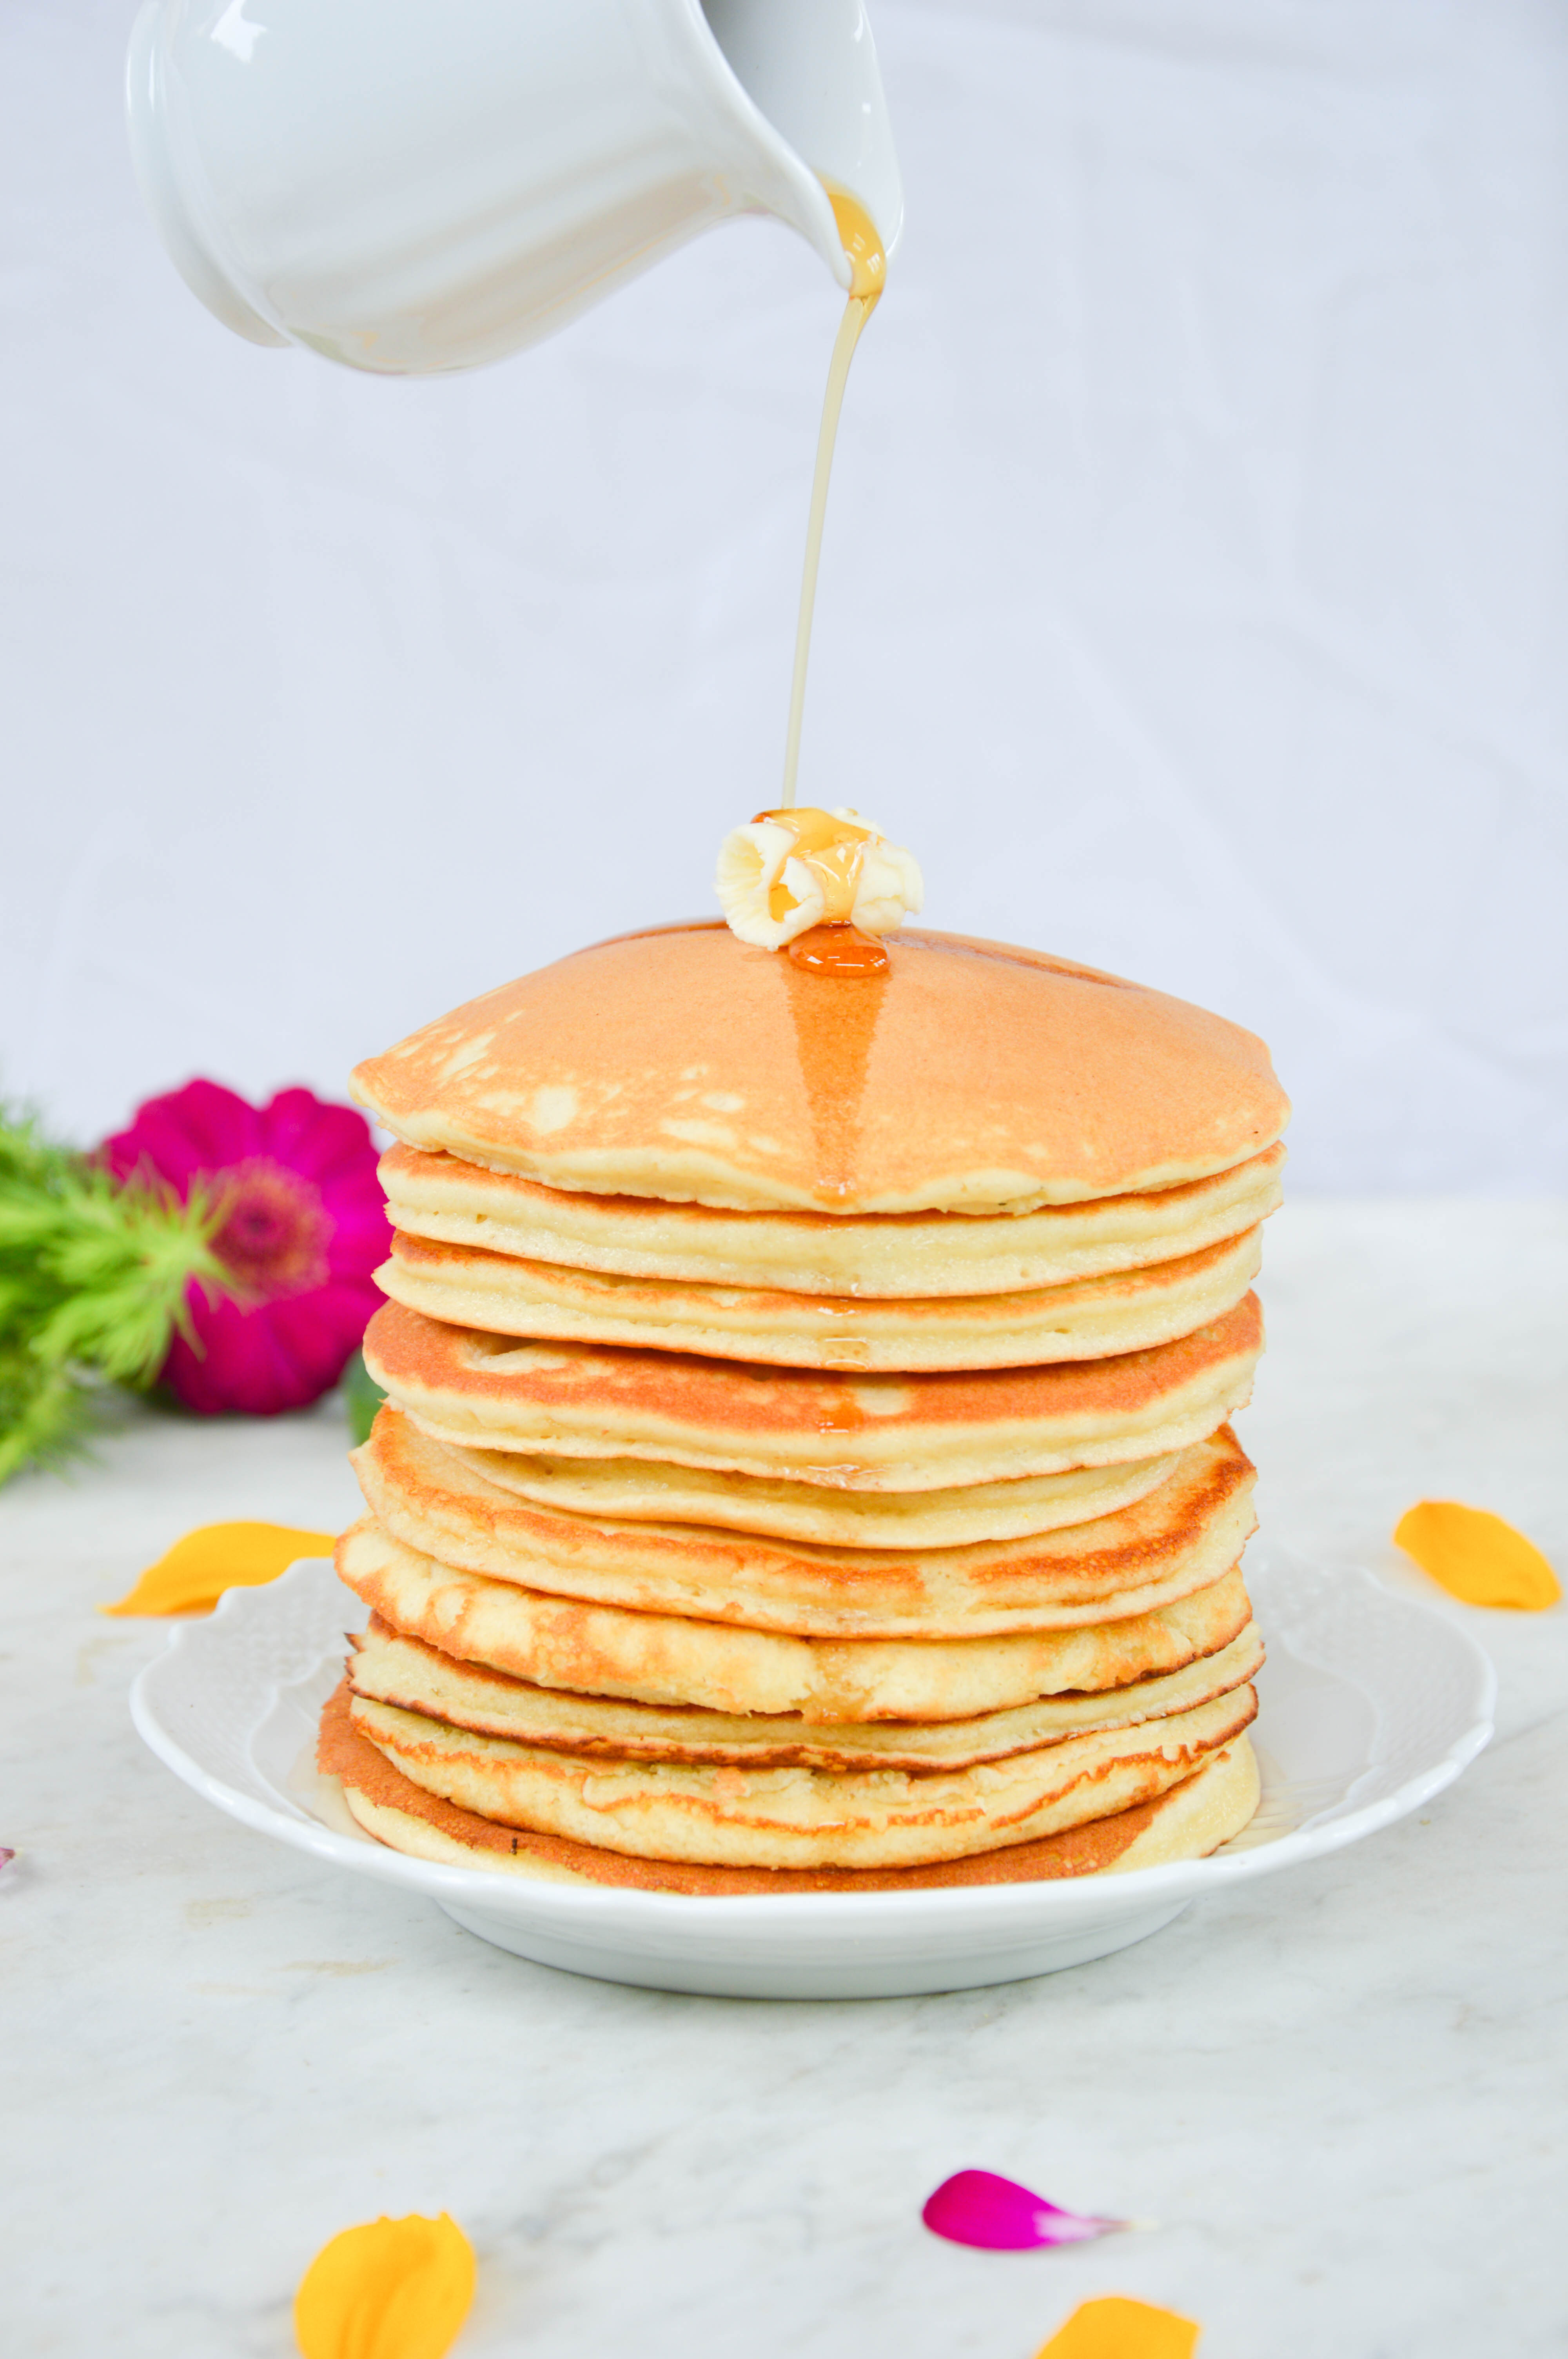 Ricetta Pancake Normali.Pancakes I Piu Buoni Chiara S Bakery